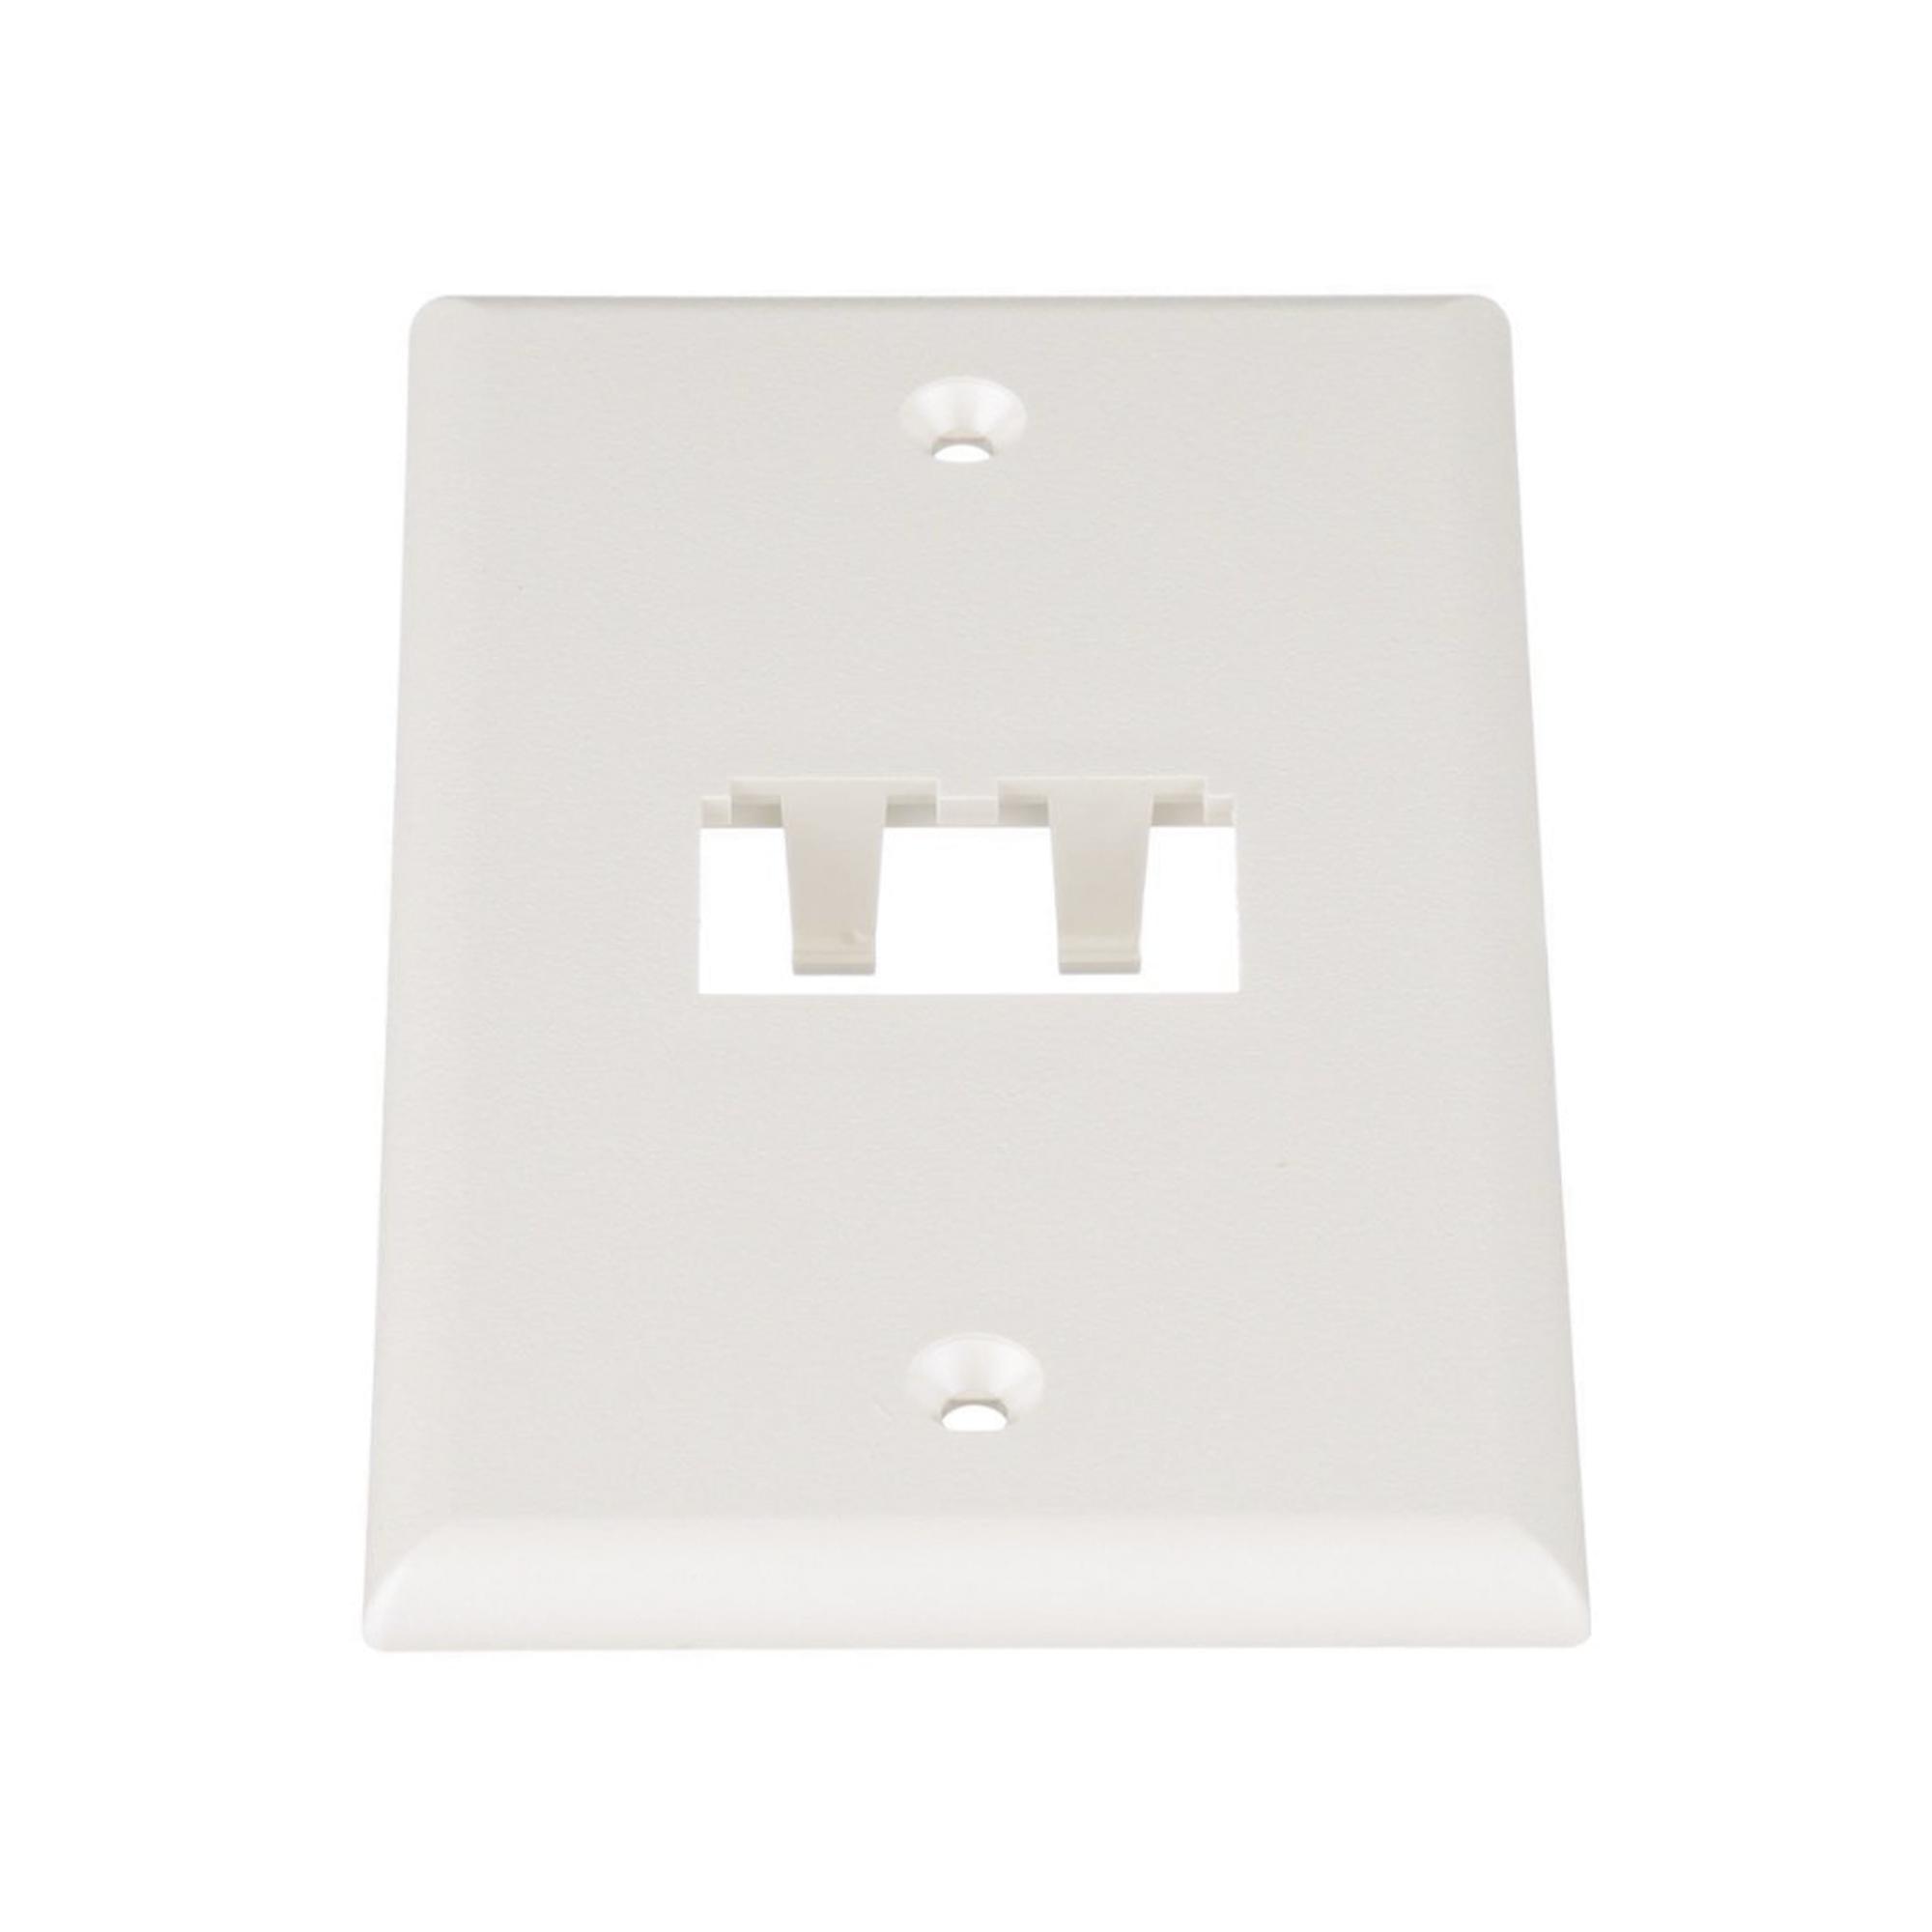 Placa de Pared Vertical Clásica, Salida Para 2 Puertos Mini-Com, Color Blanco Mate